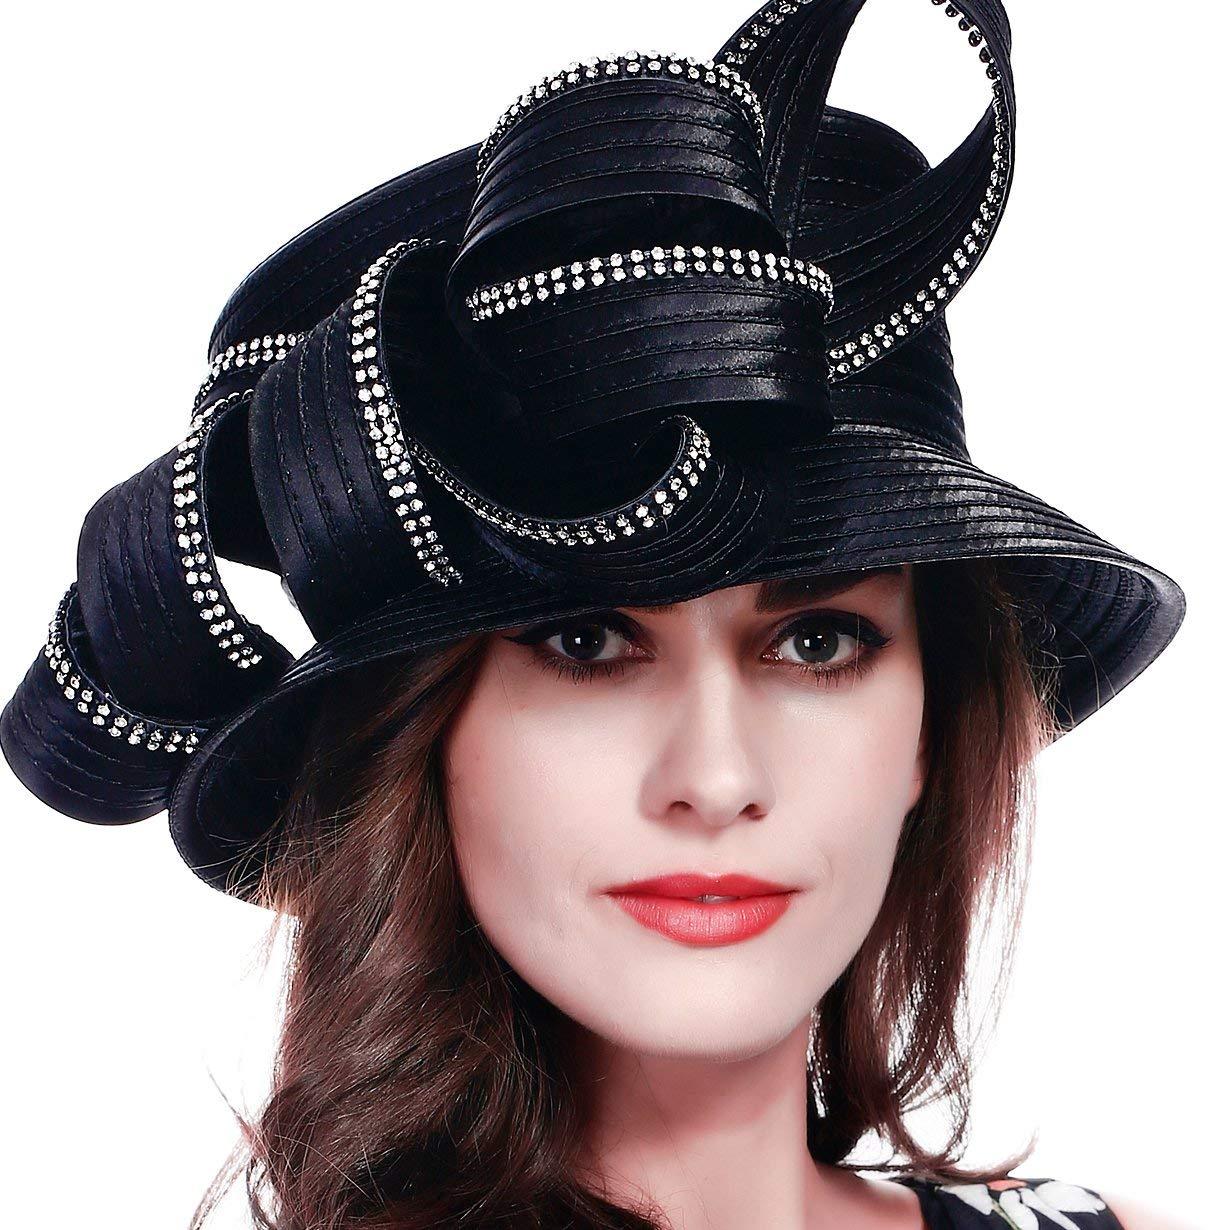 78b89eb6 Get Quotations · FORBUSITE Rhinestone Satin Braid Church Hats For Ladies